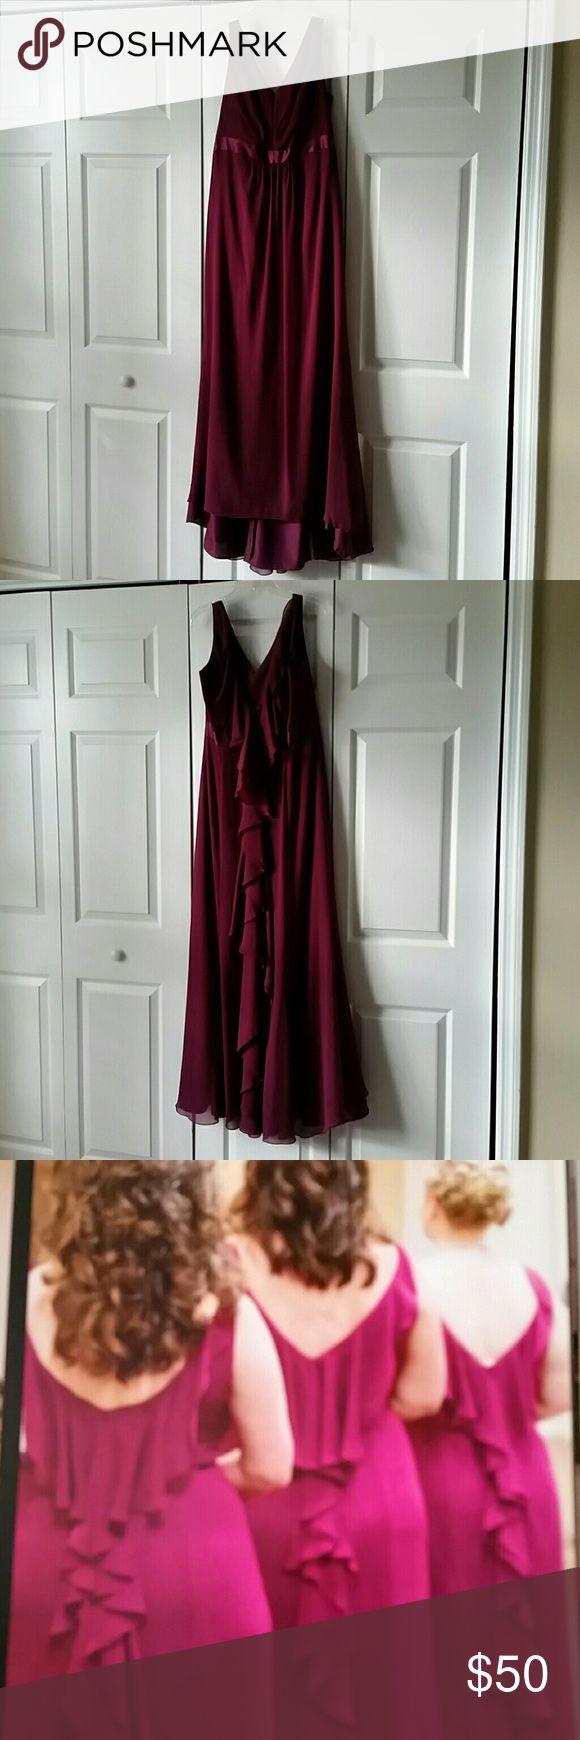 Davids Bridal bridesmaid dress The perfect dress! Stunning back! Color:Sangria Davids Bridal Dresses Wedding